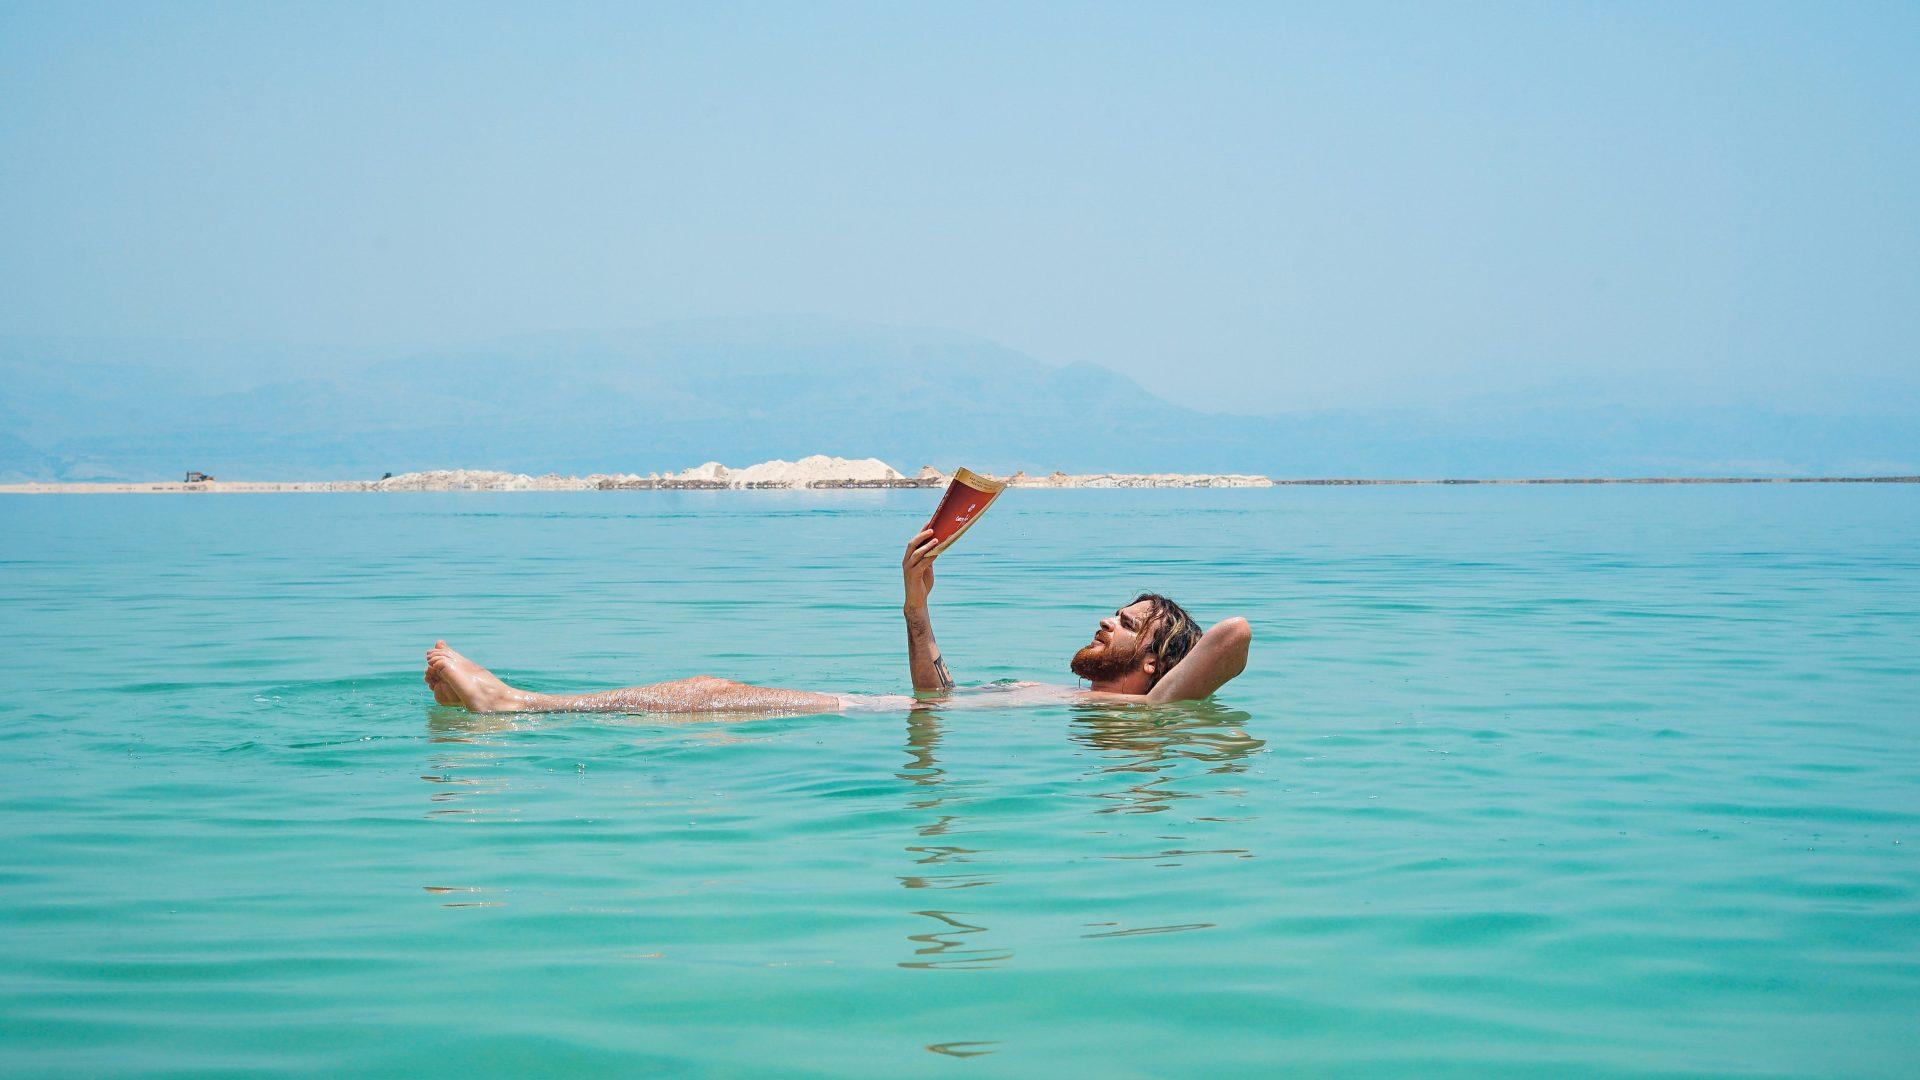 Dead Sea Israel in the summer